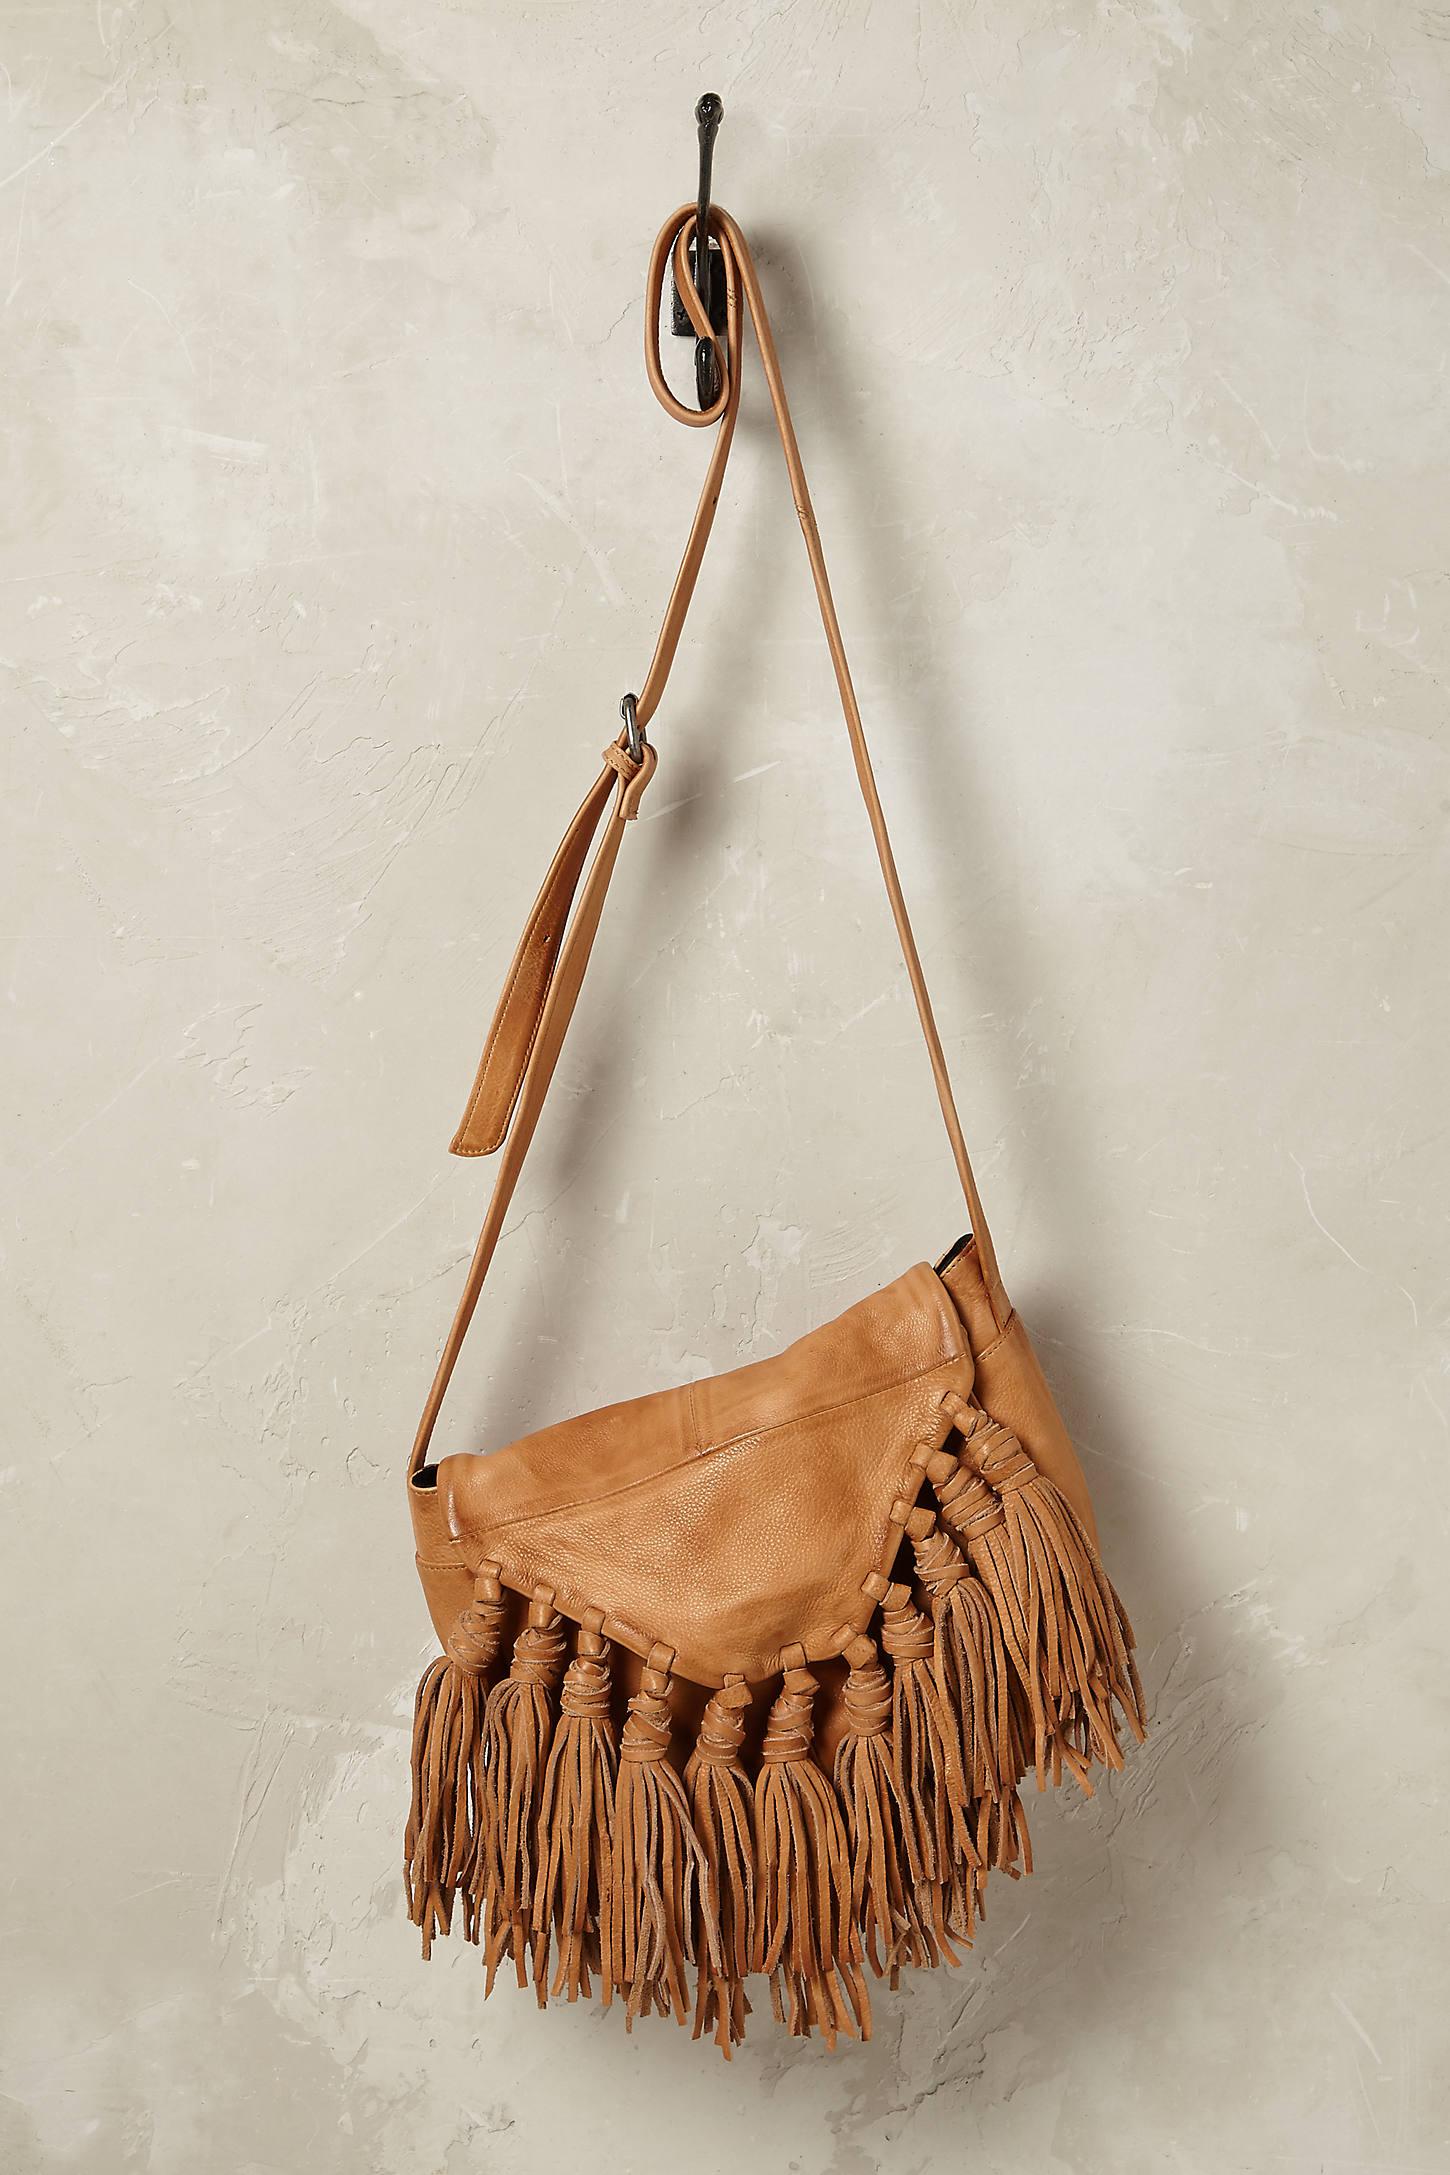 Lee Fringed Crossbody Bag